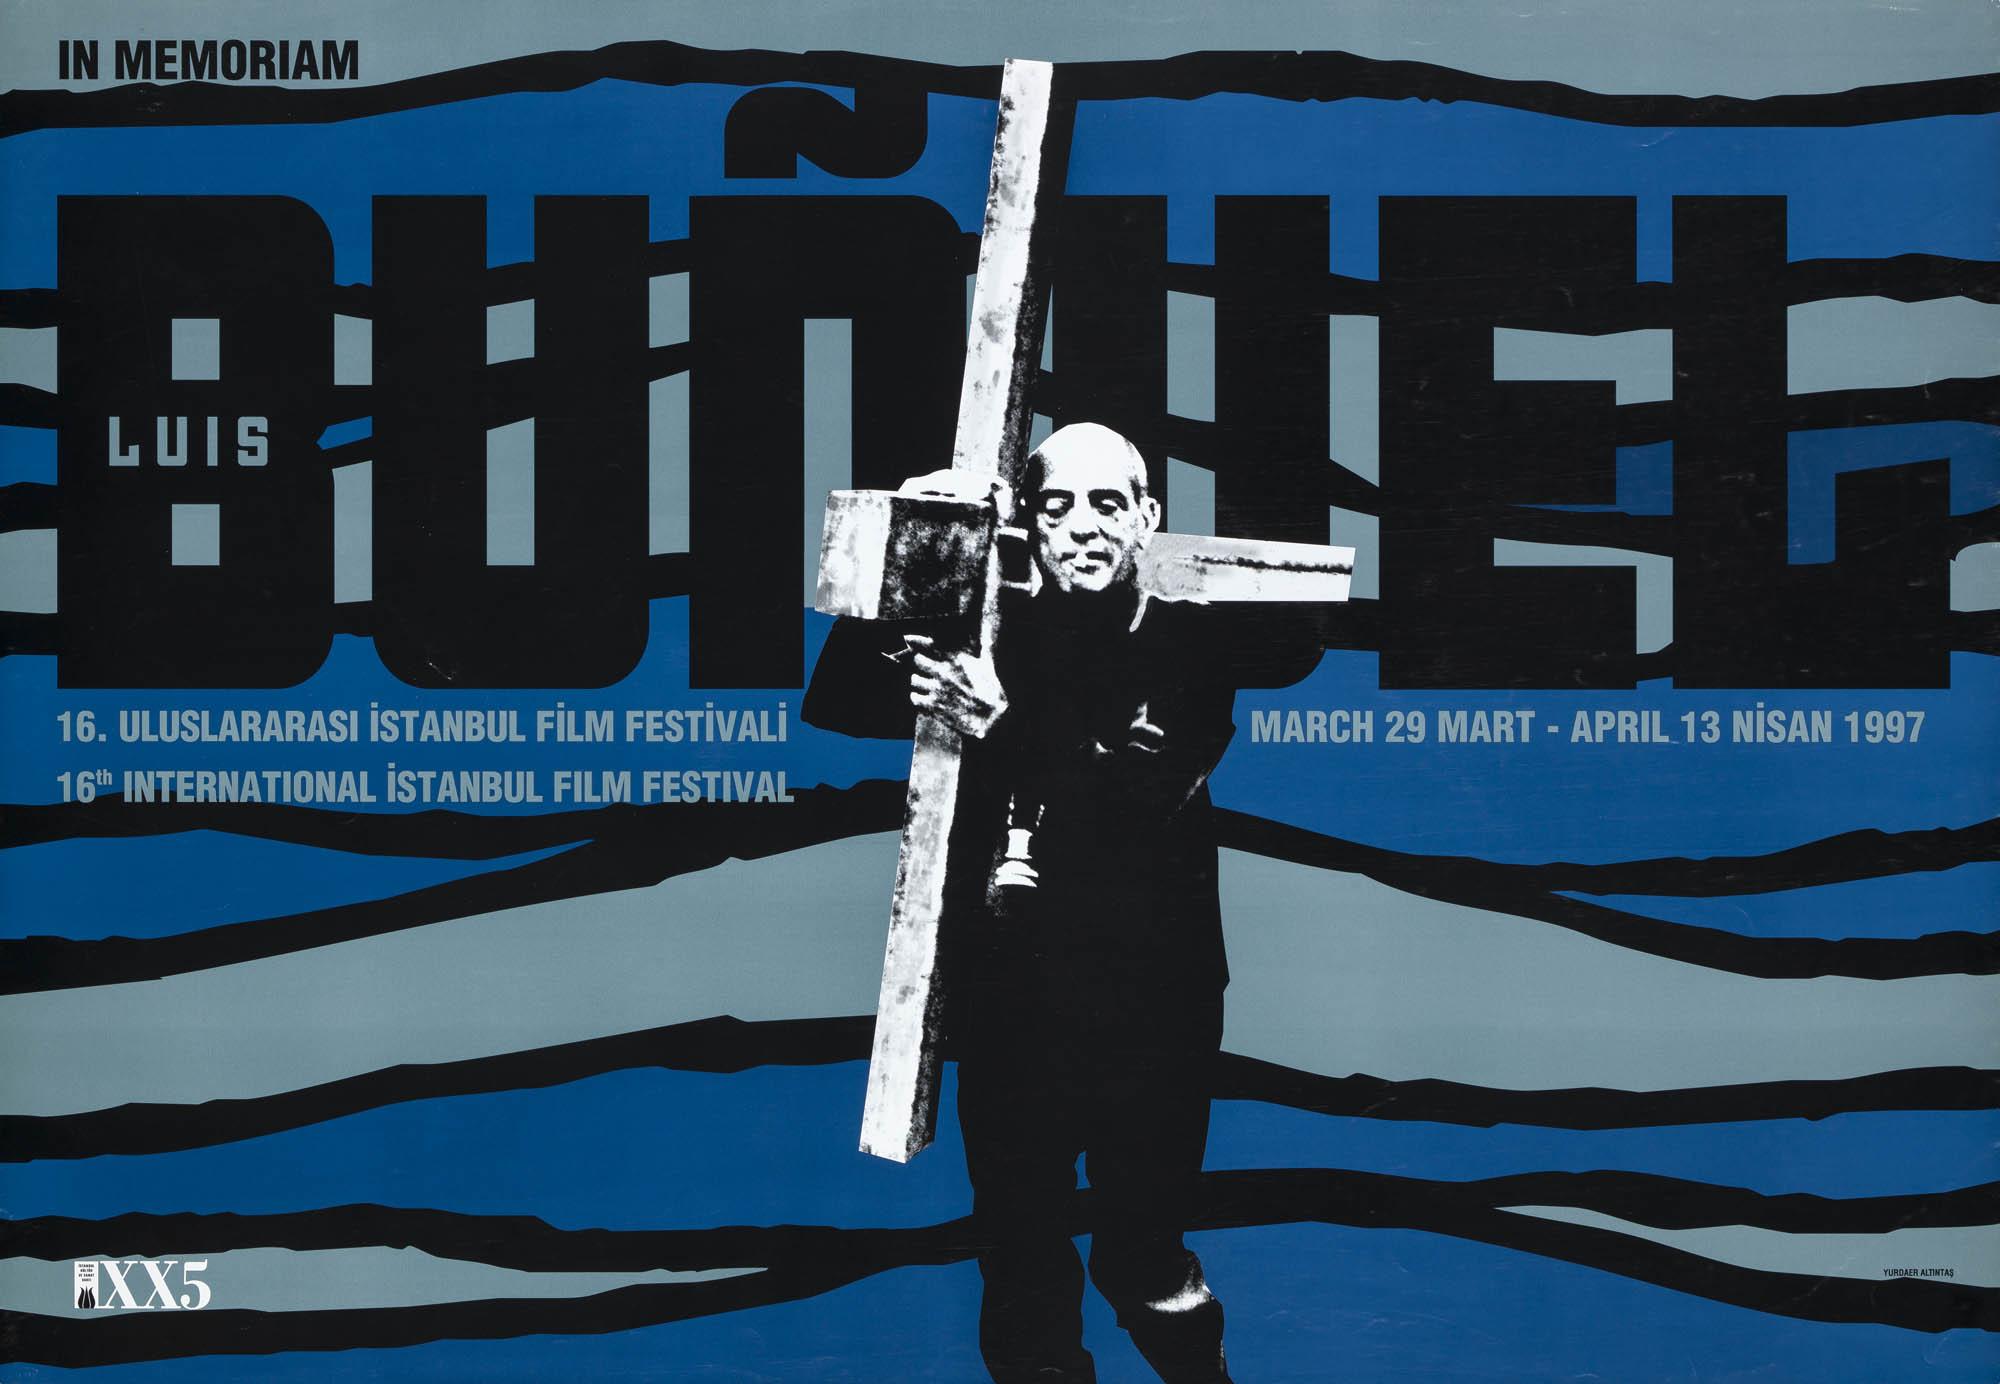 Luis Buñuel – Filmpodium Zürich Paul Brühwiler Poster